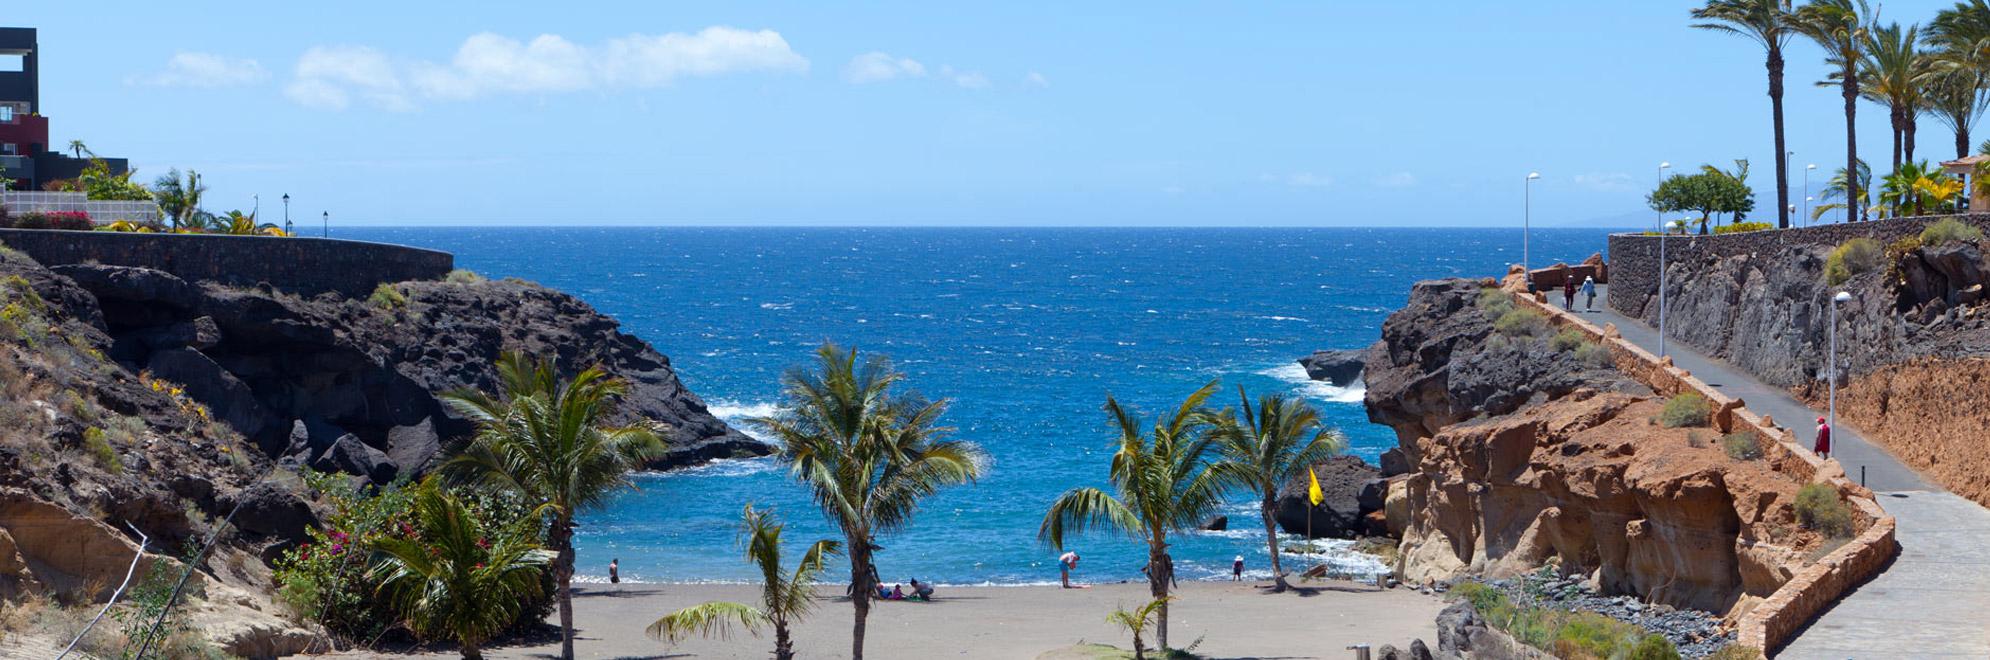 Lage Roca Nivaria Gh Adrian Hoteles Playa Paraiso Teneriffa